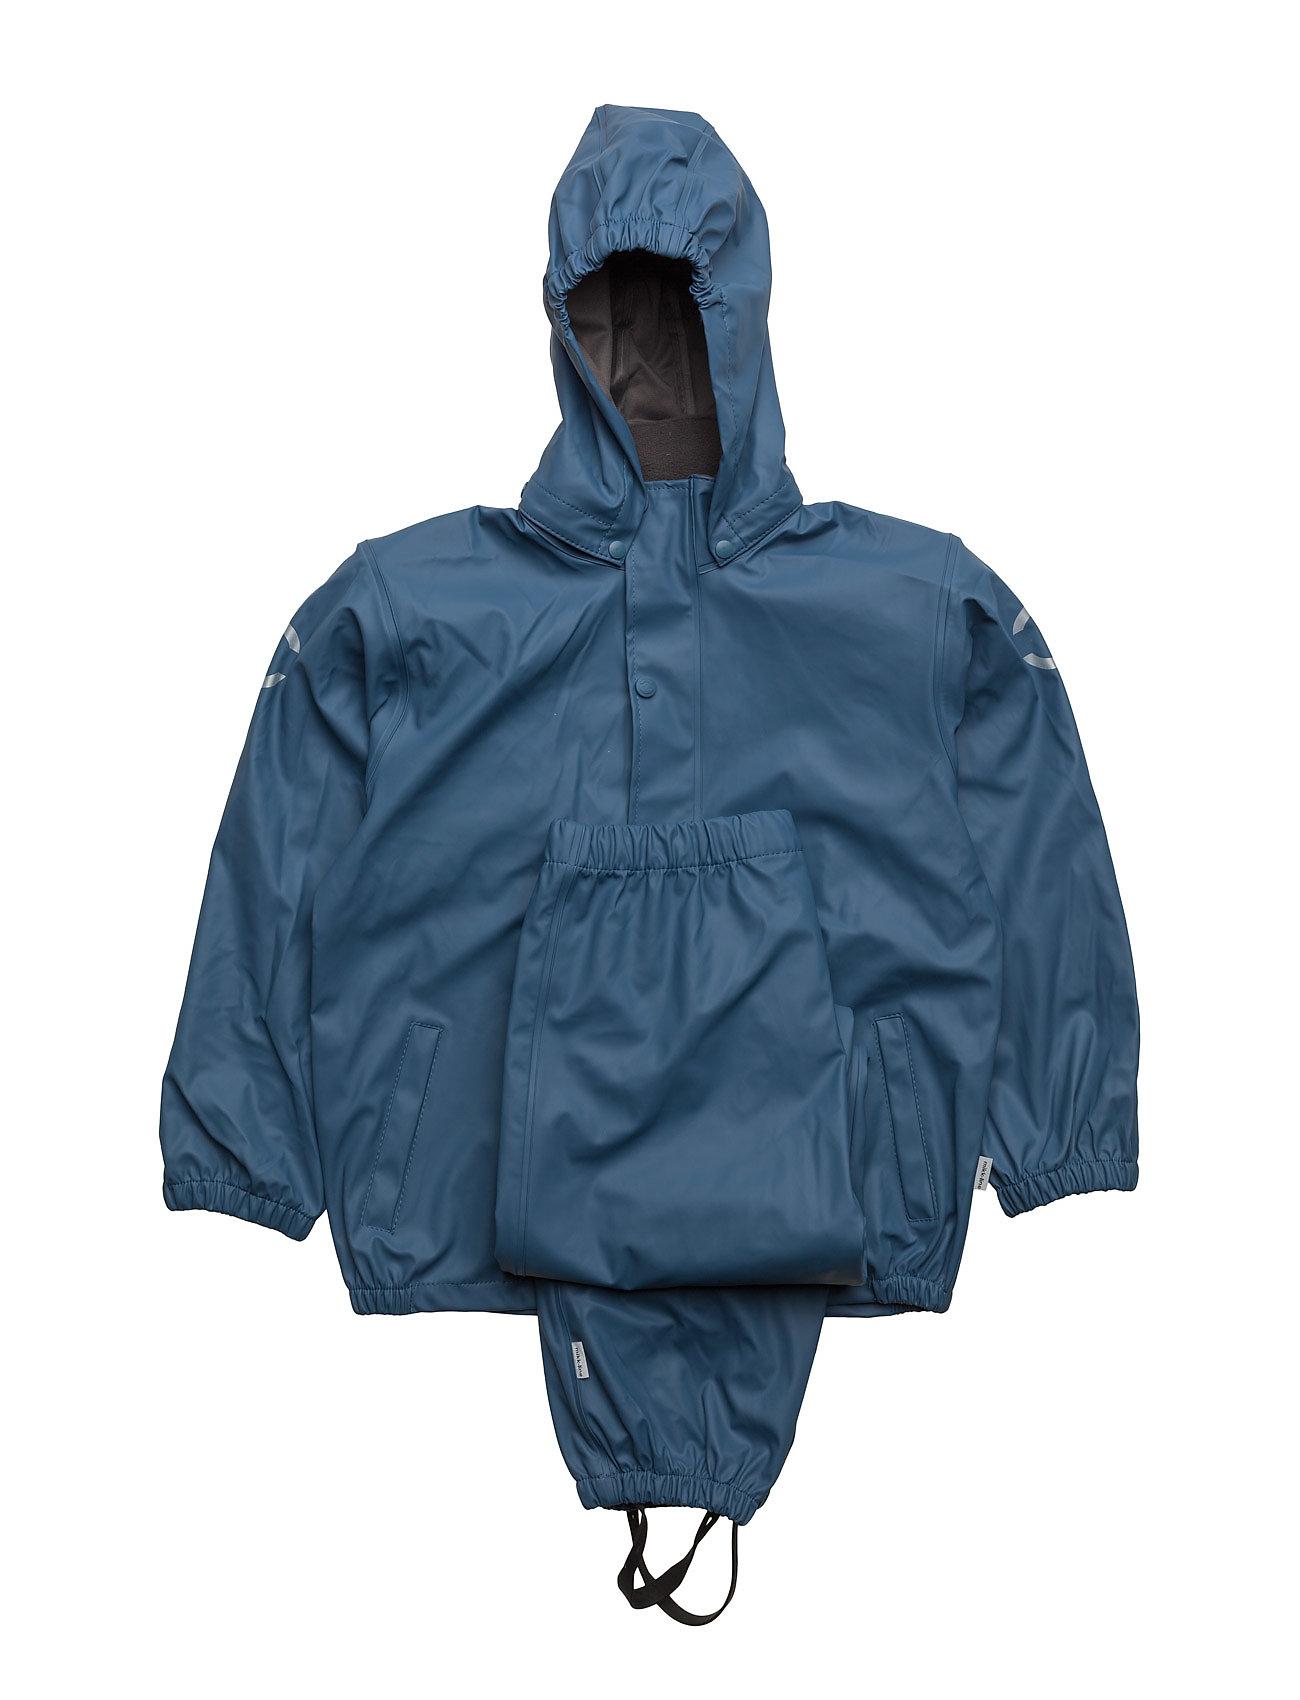 Pu Rainwear Basic Set Mikk-Line Fleece